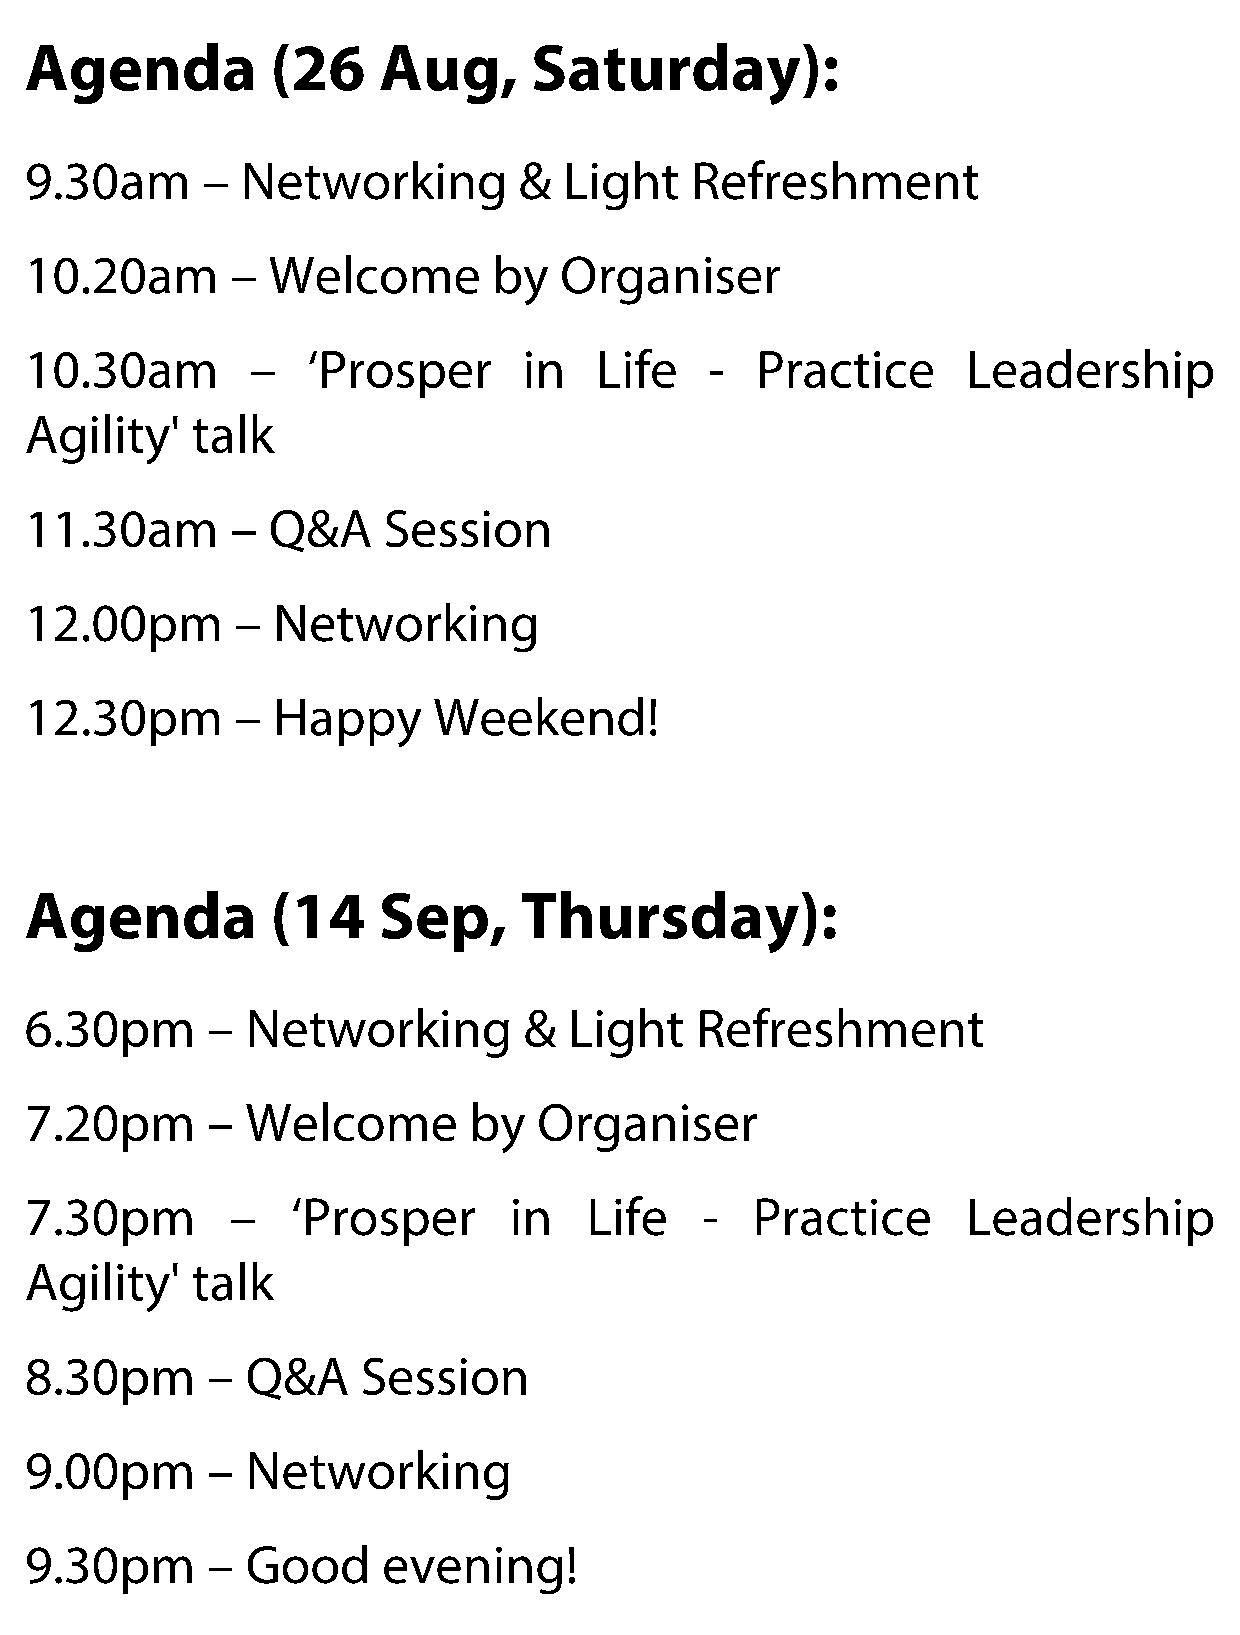 Mastering Leadership Agility - Agenda